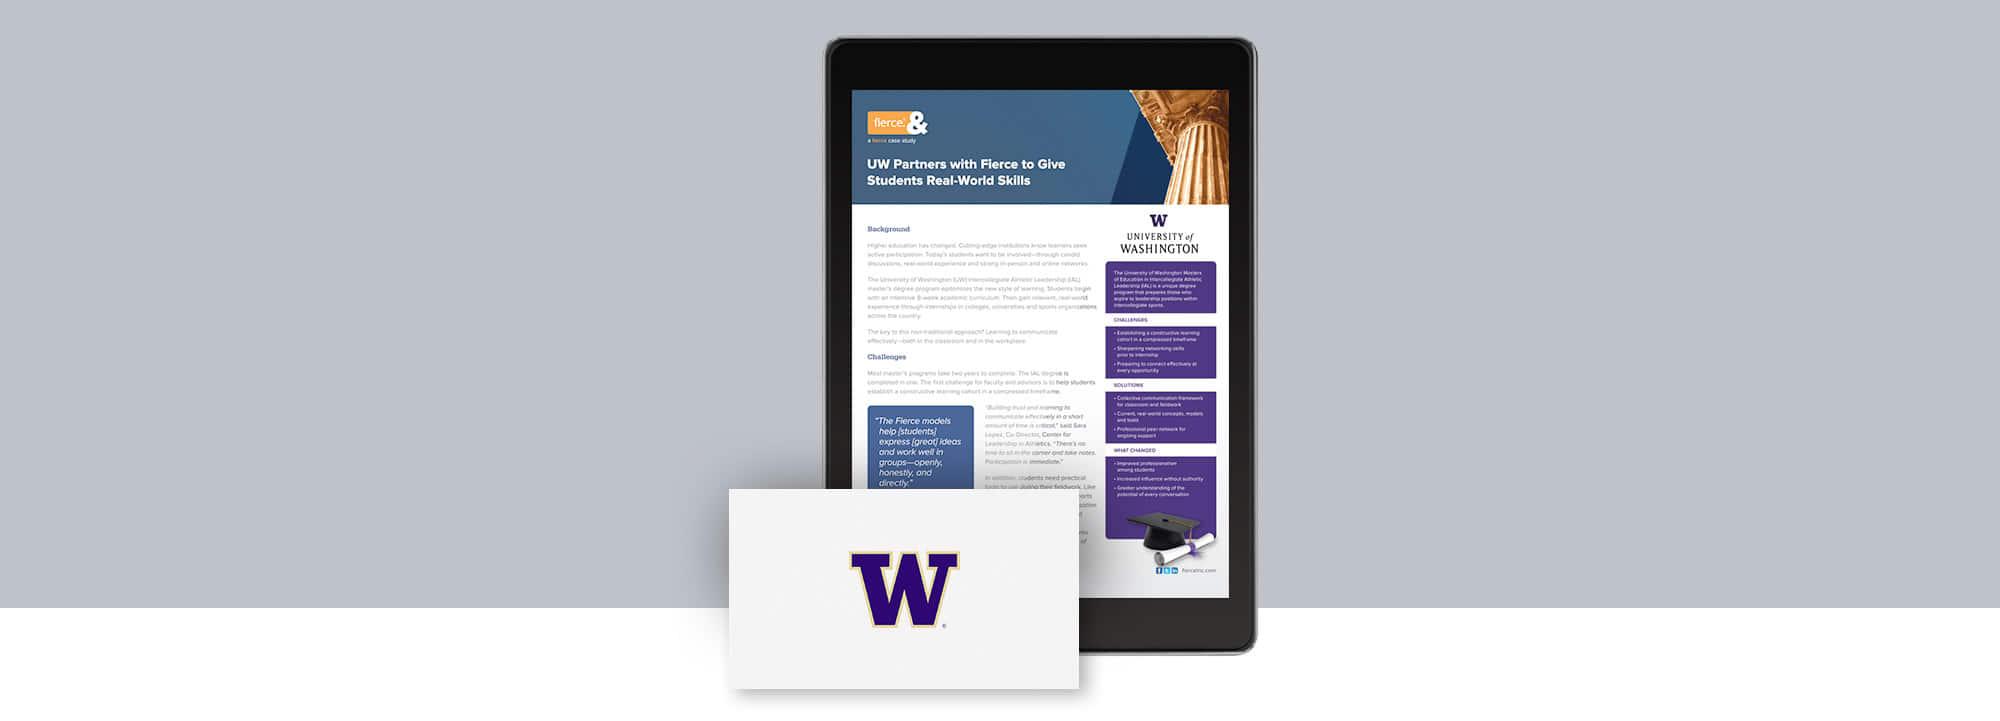 Fierce Conversations University of Washington Case Study